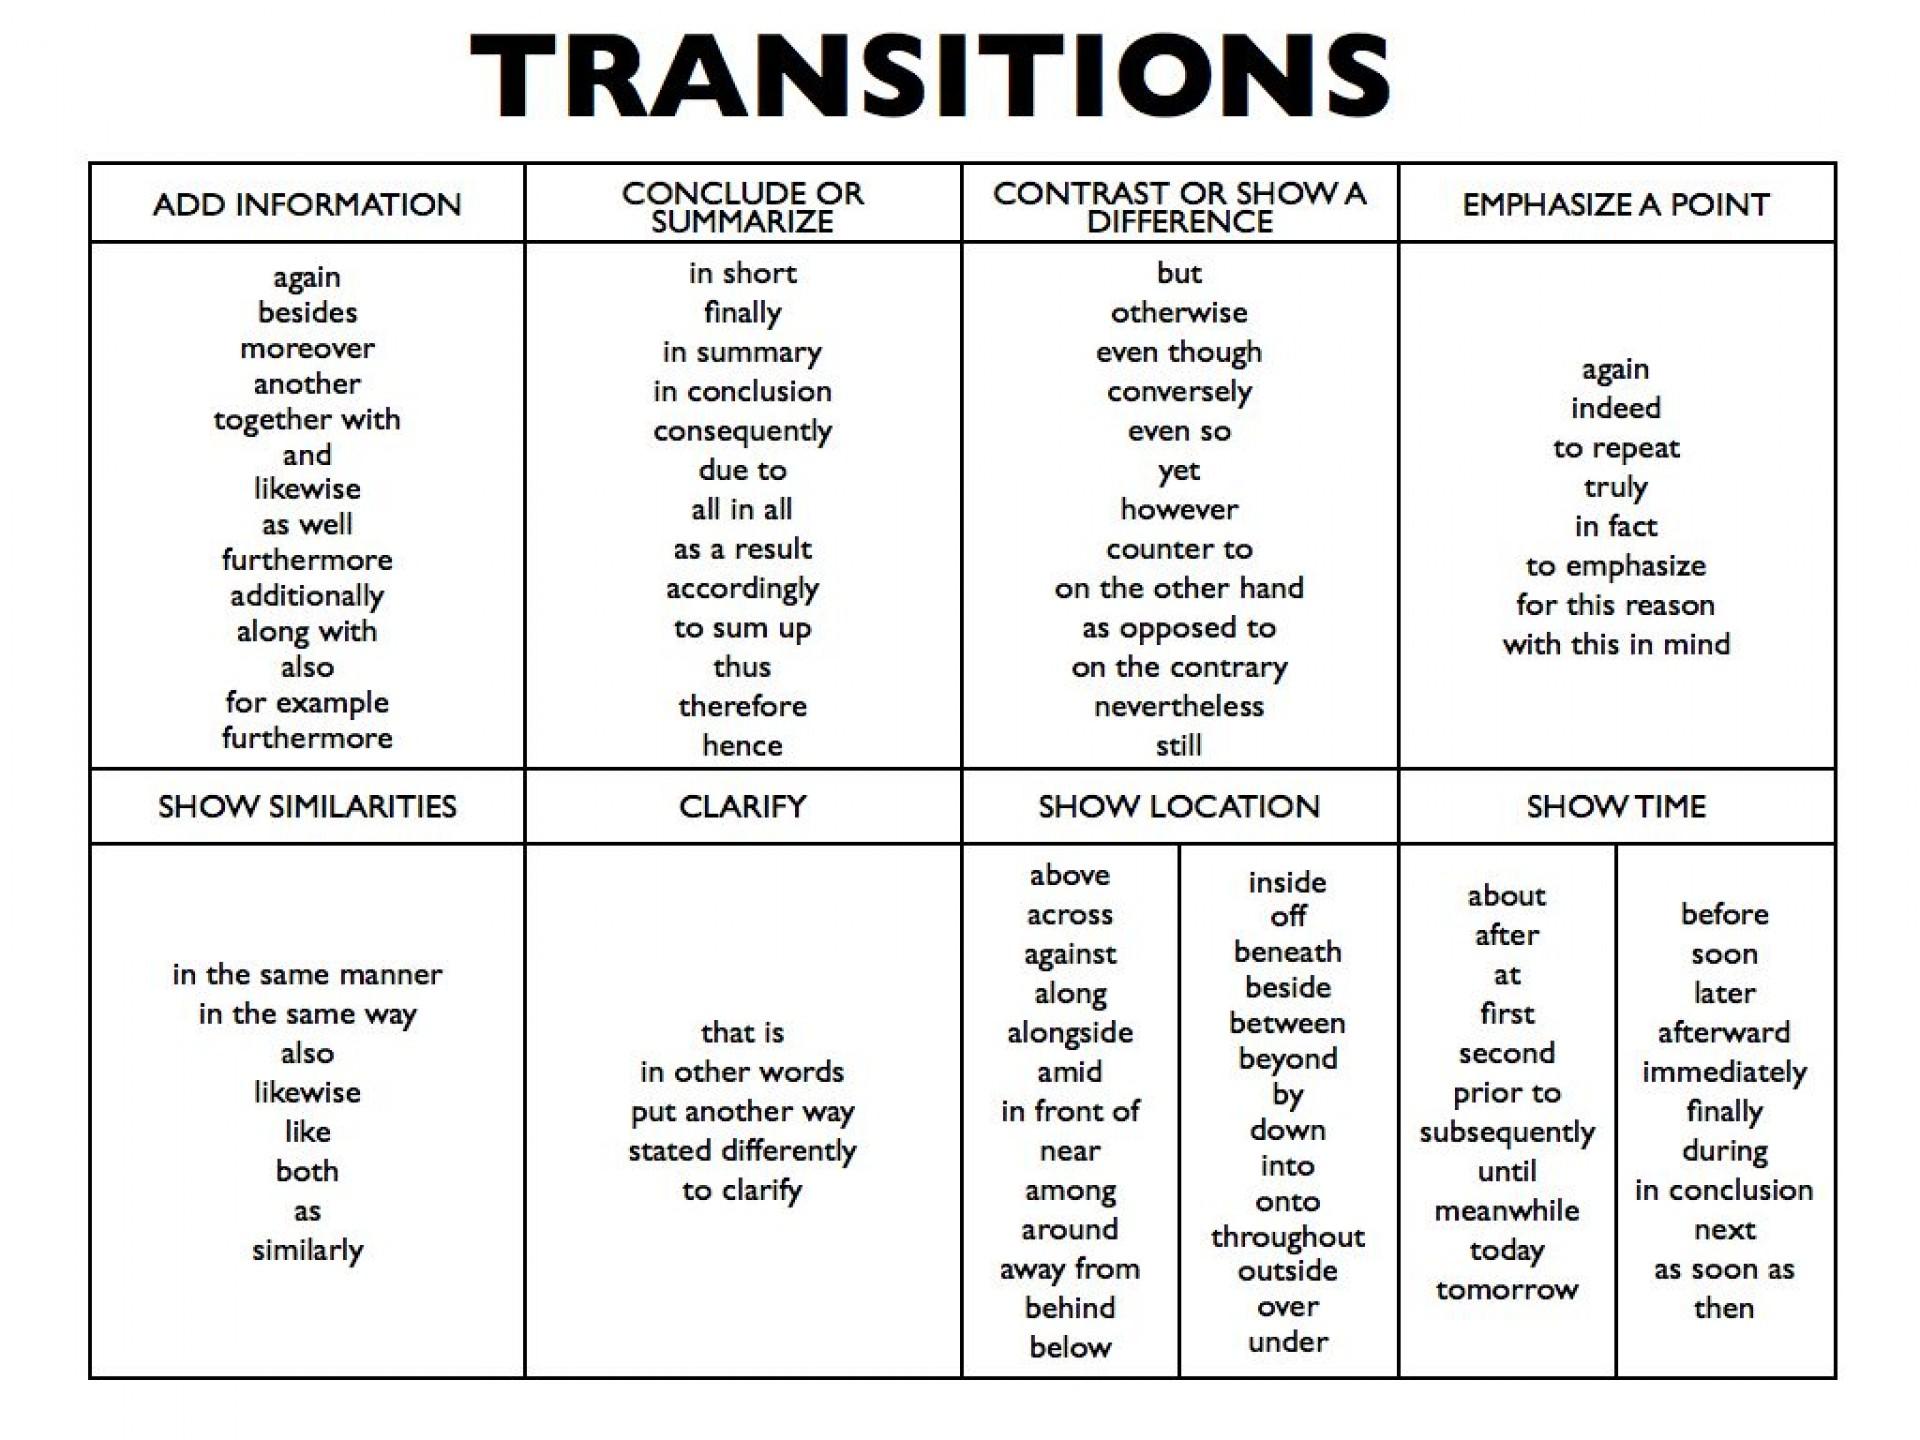 005 argumentative essay transition sentence help vahomeworkfejc